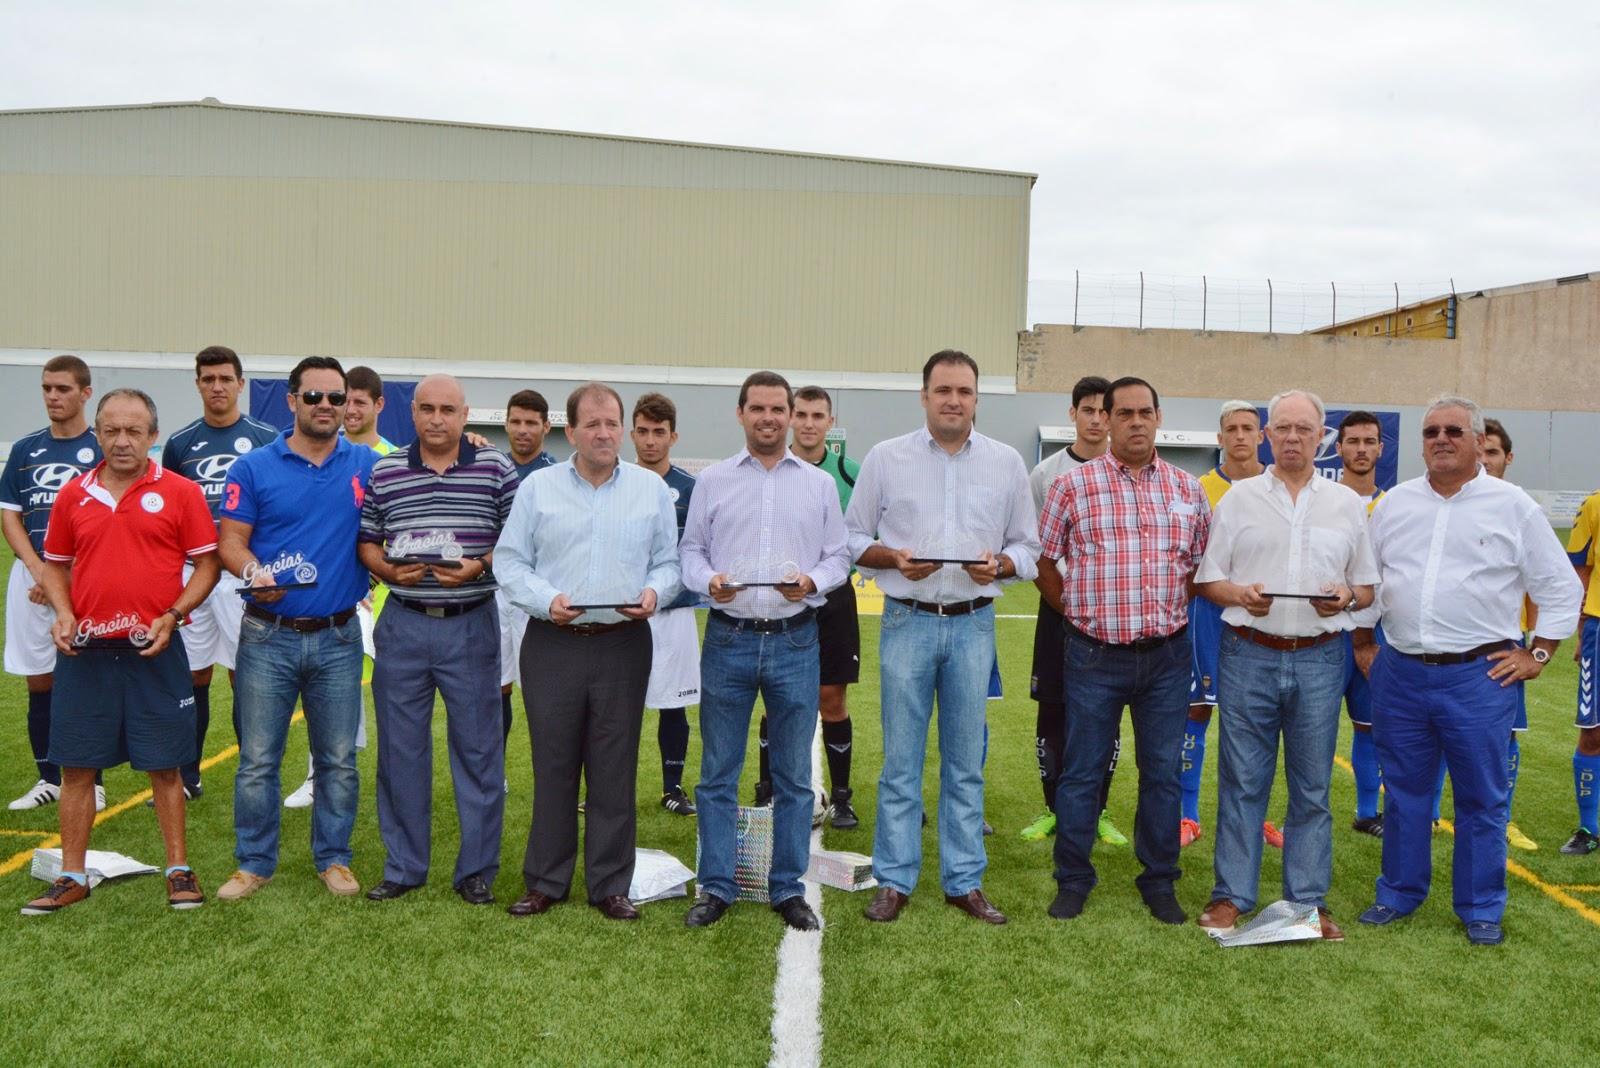 Inauguraci n nuevo c sped artificial campo de f tbol - Cesped artificial las palmas ...